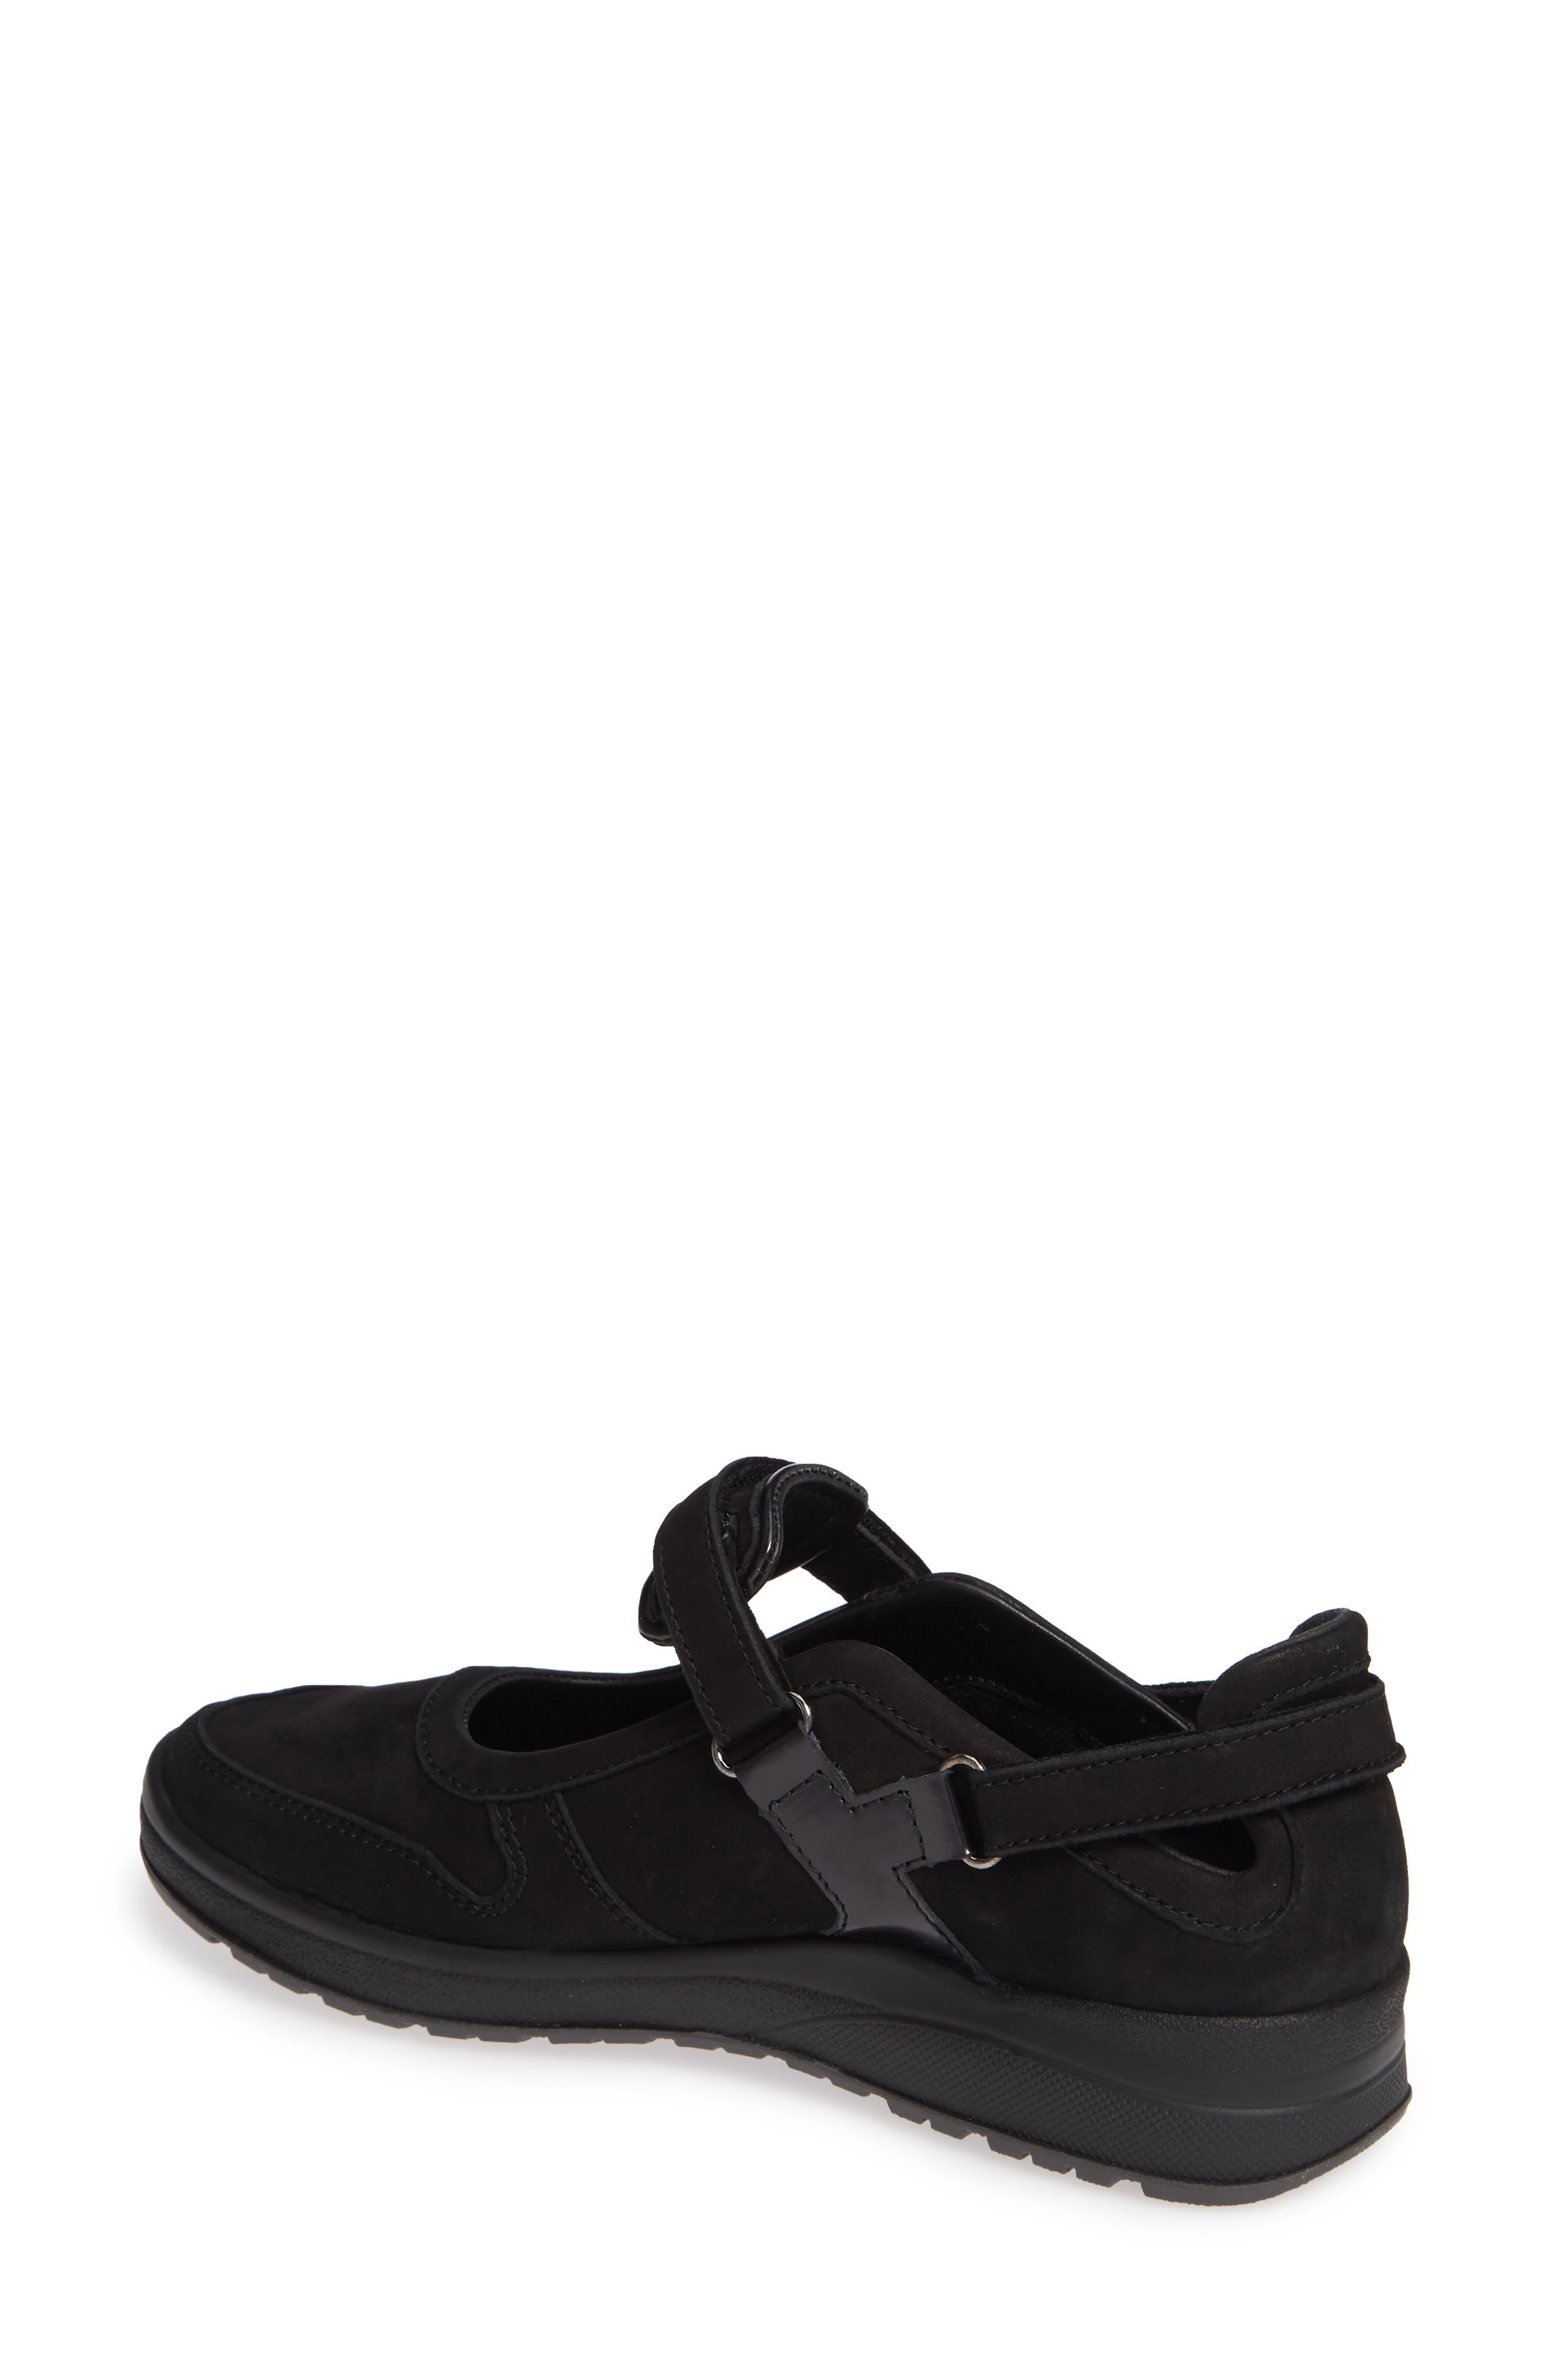 MEPHISTO, Rejine Sneaker, Alternate thumbnail 2, color, BLACK FABRIC